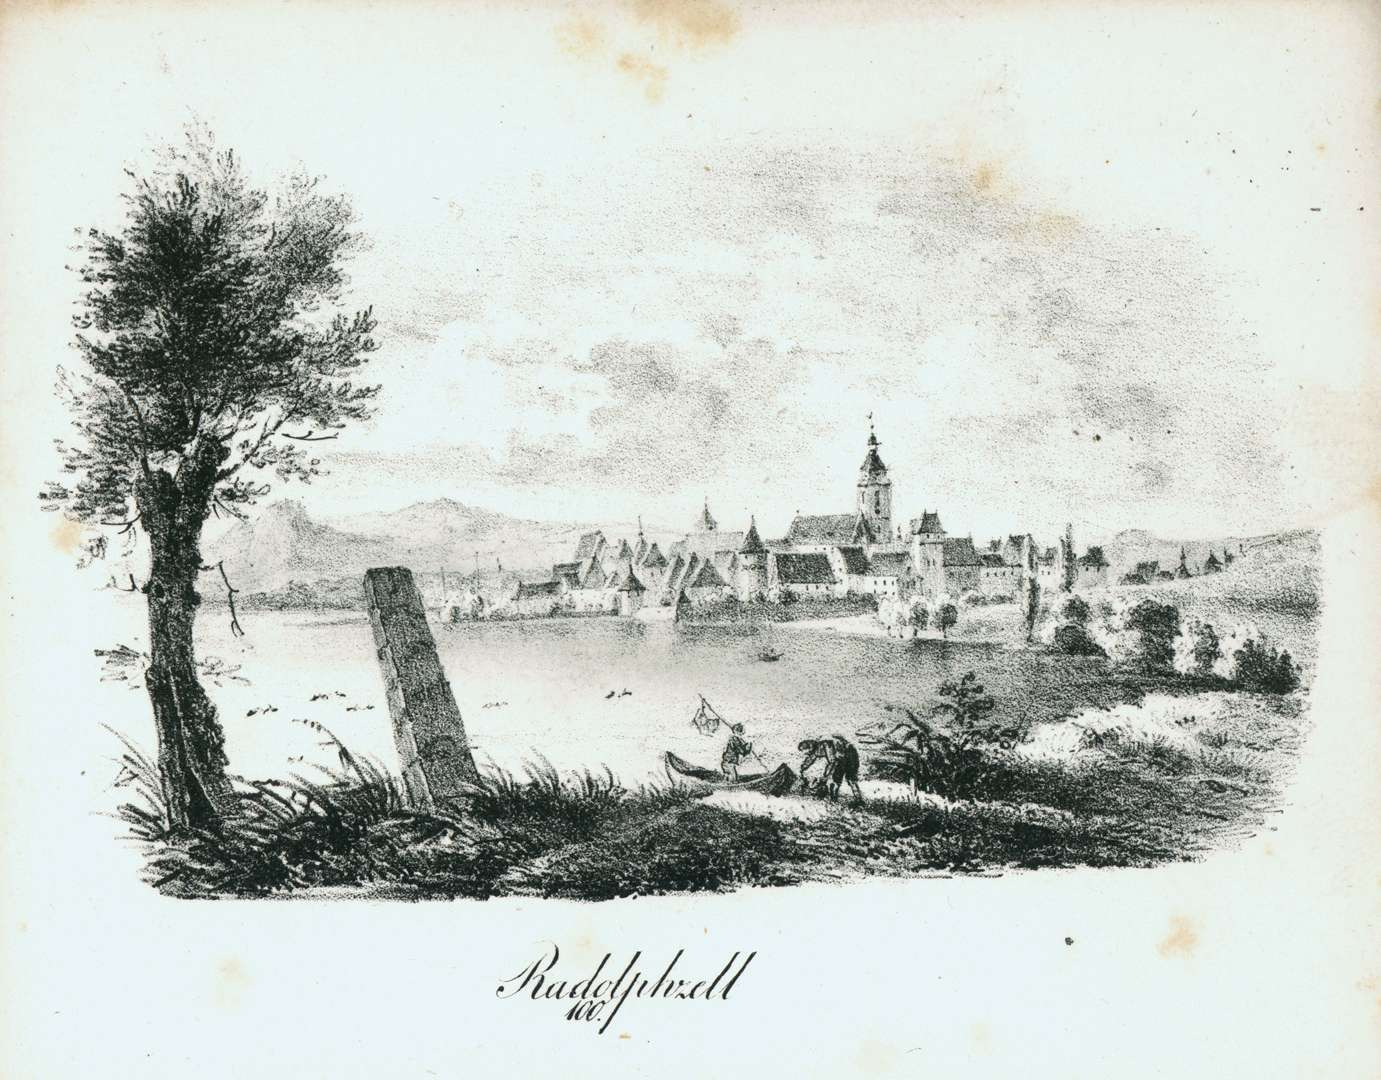 Radolphzell [Radolfzell], Bild 1